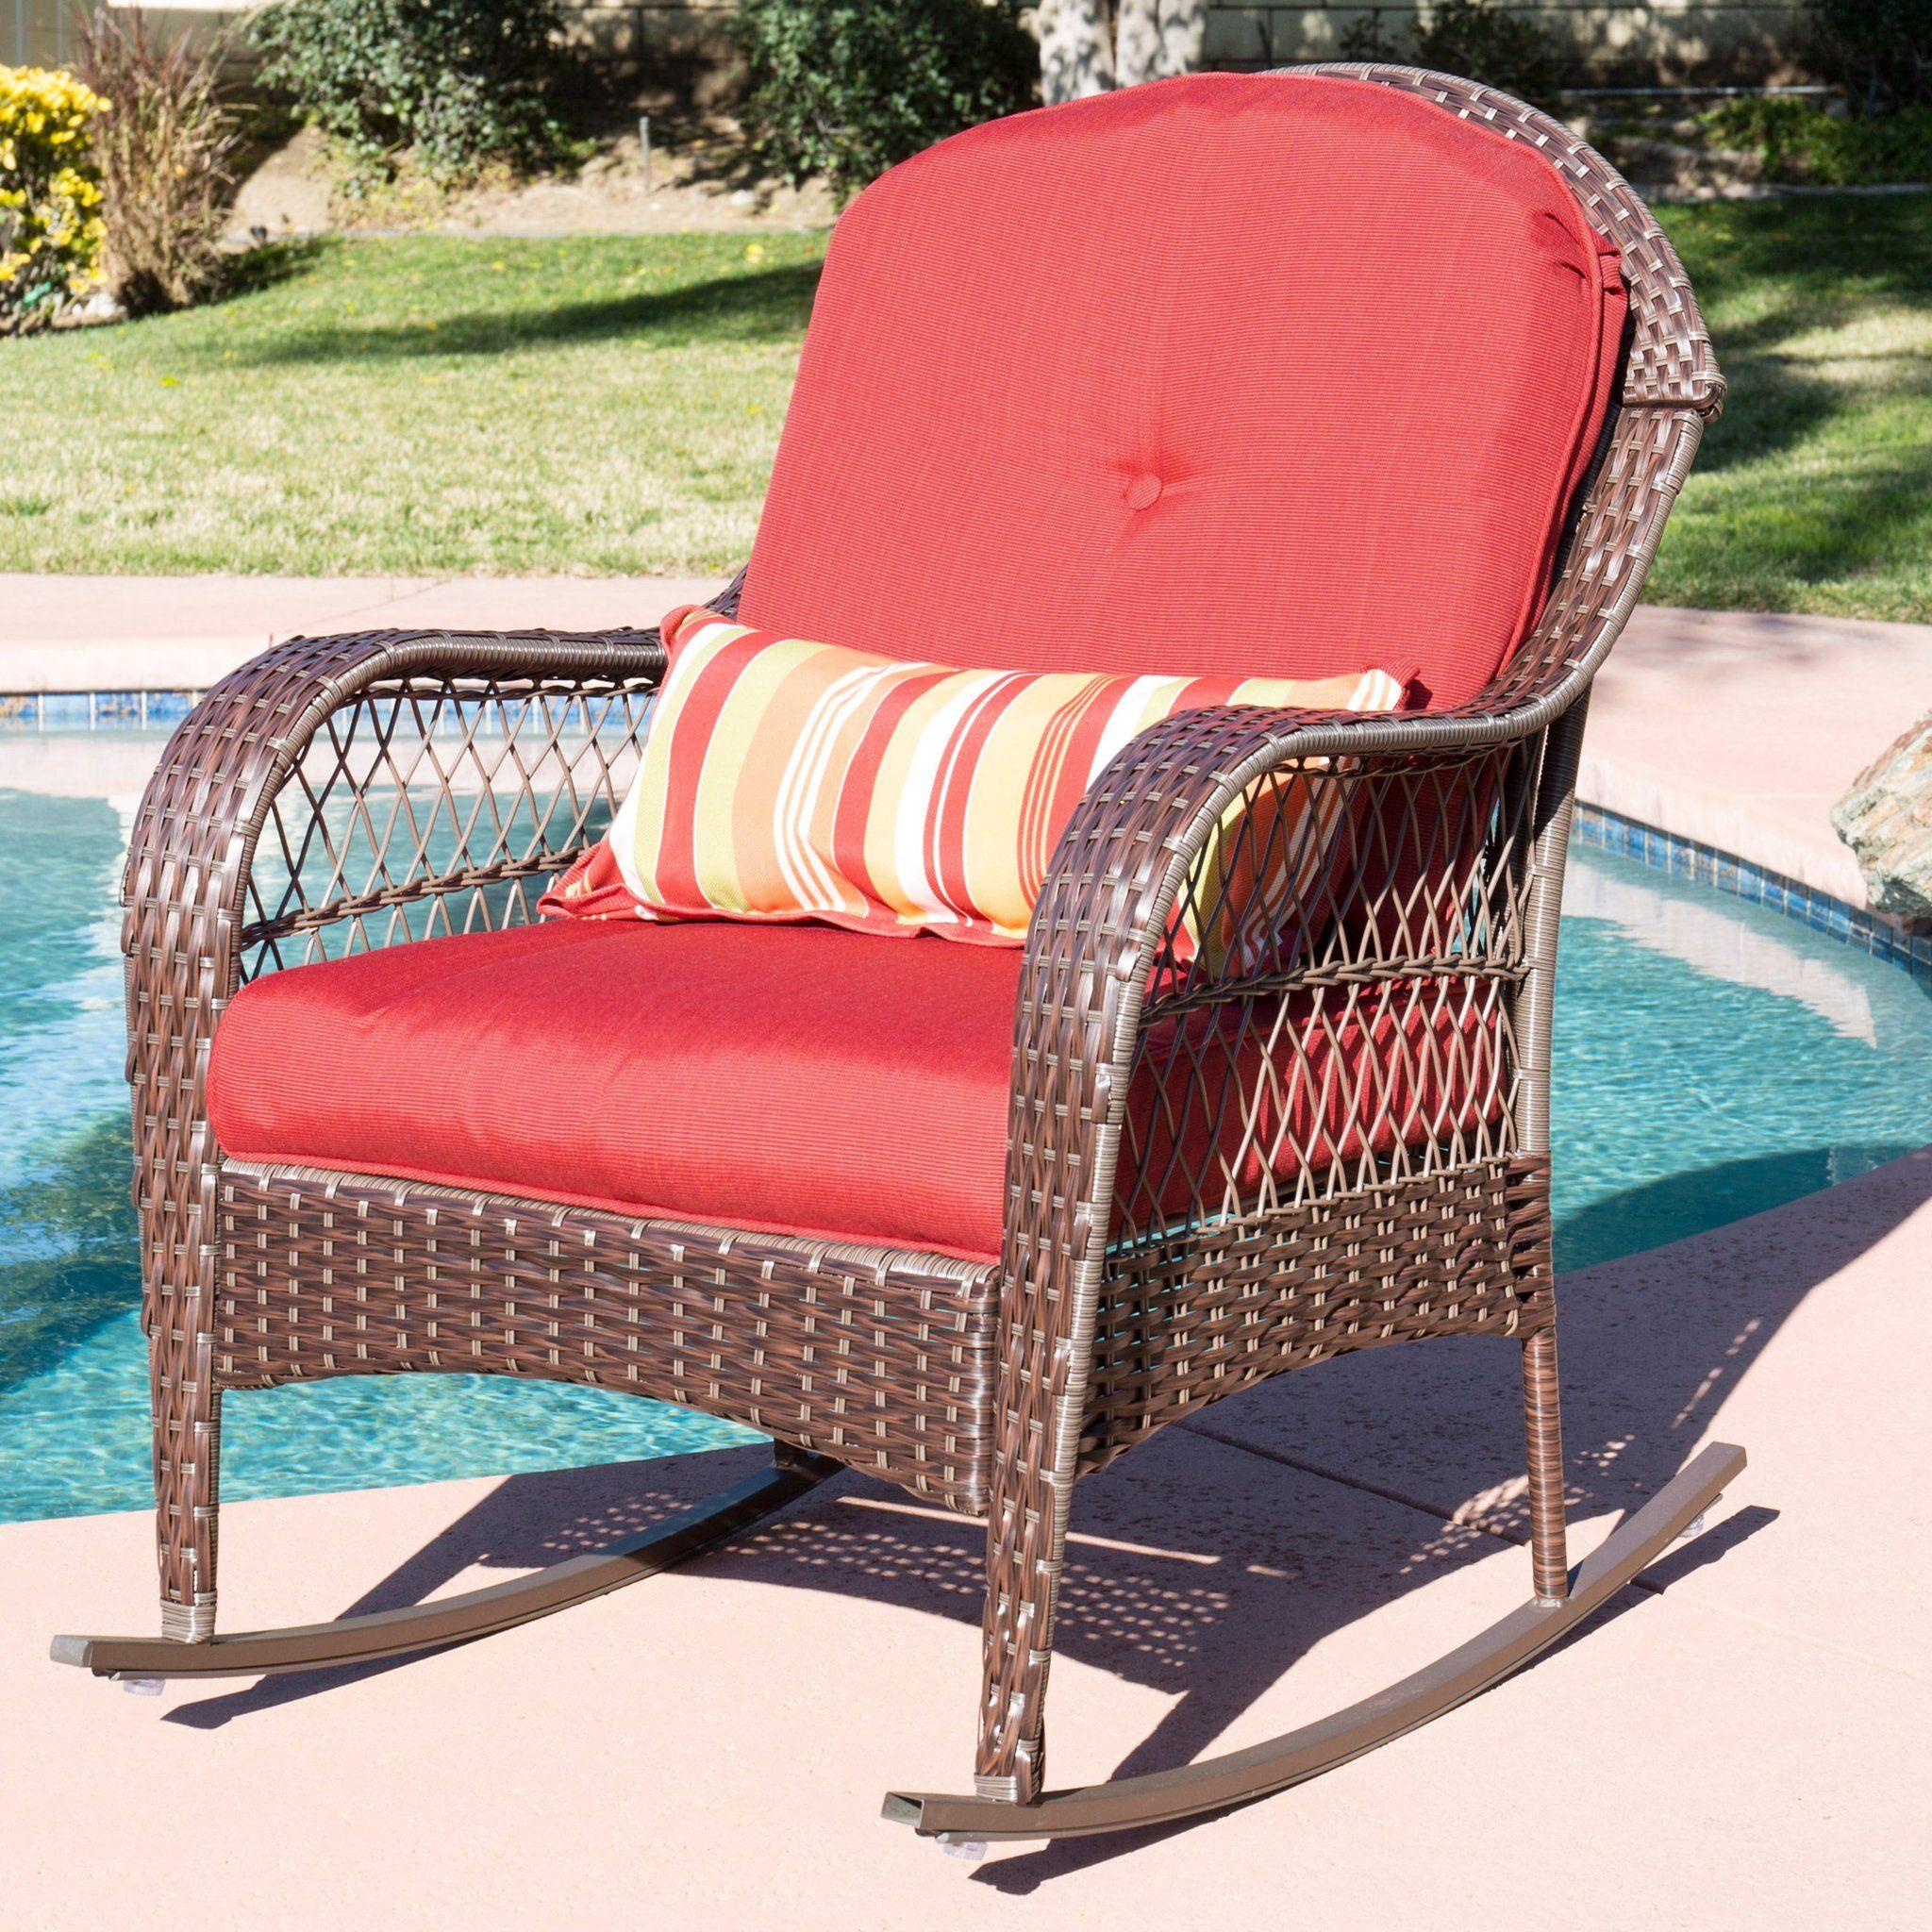 Outdoorseating patiofurniture patio furniture pinterest